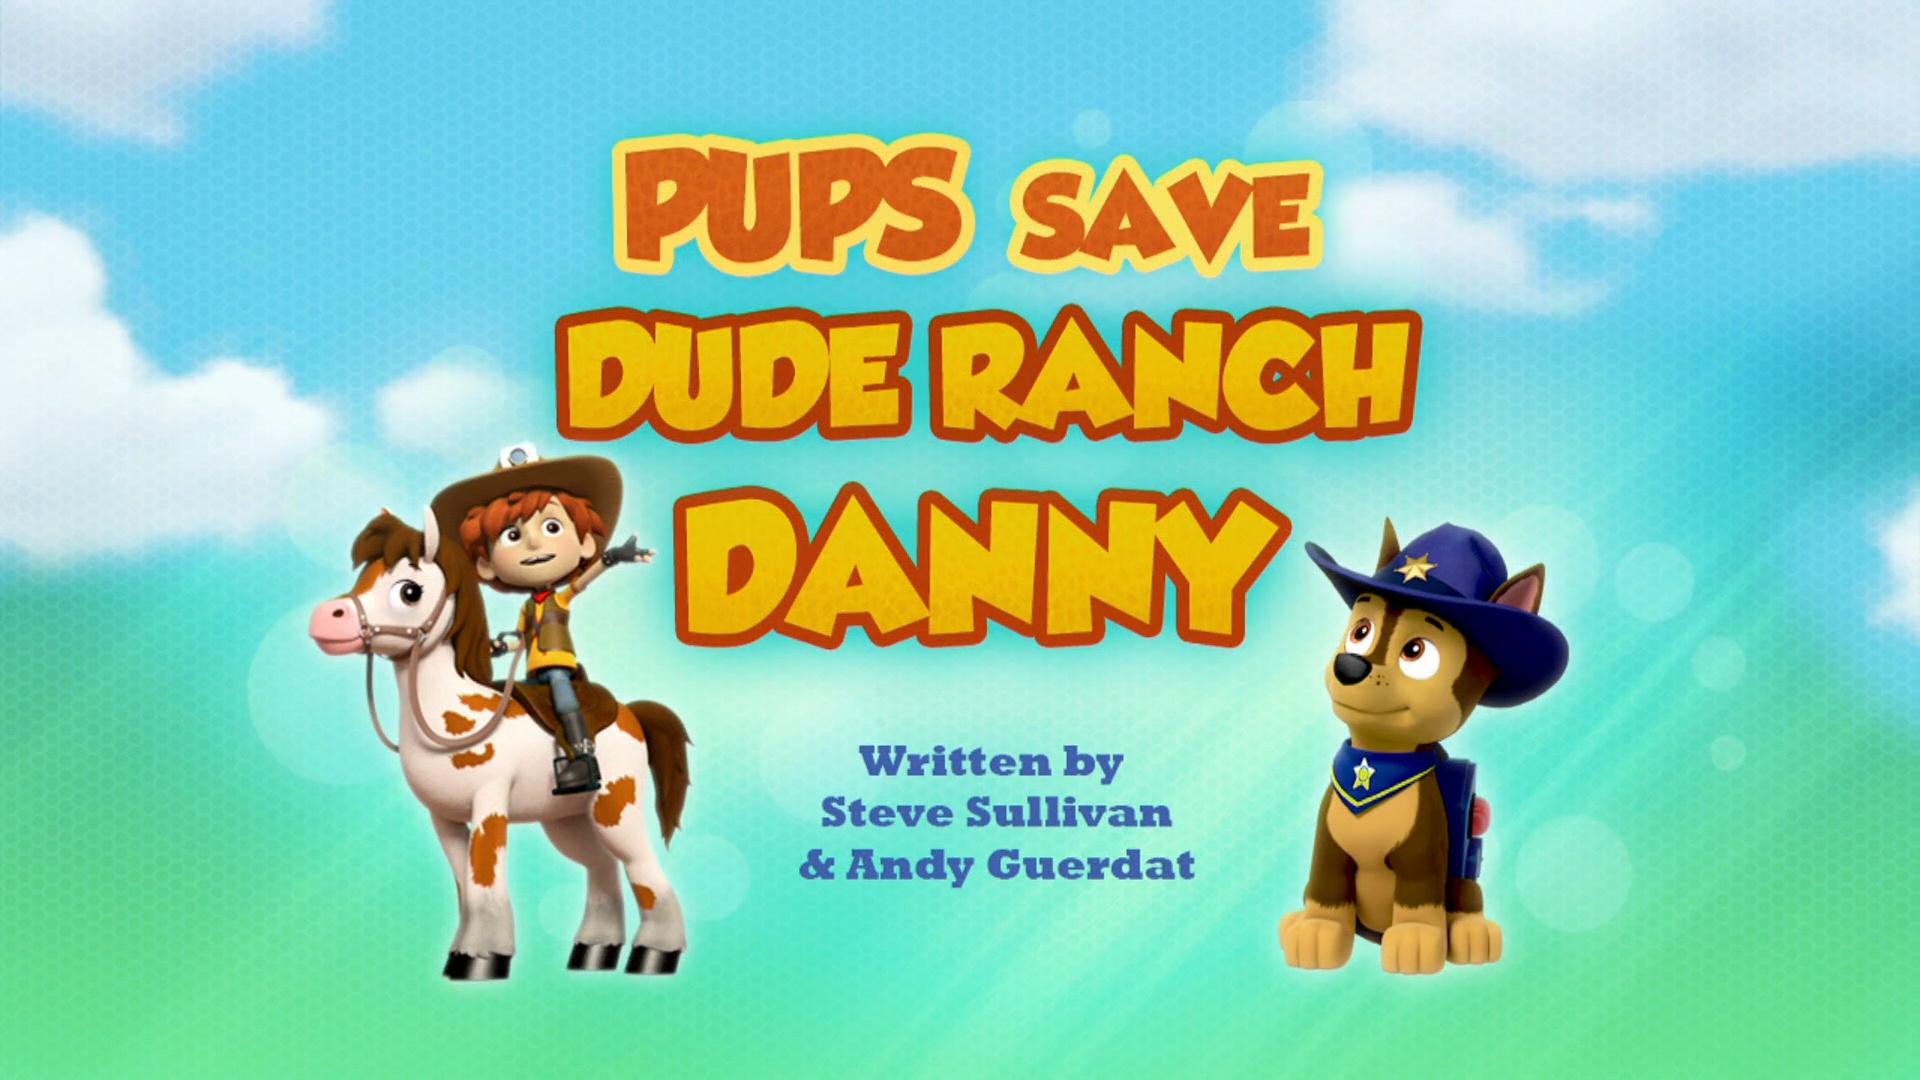 Image Pups Save Dude Ranch Danny Hq Png Paw Patrol